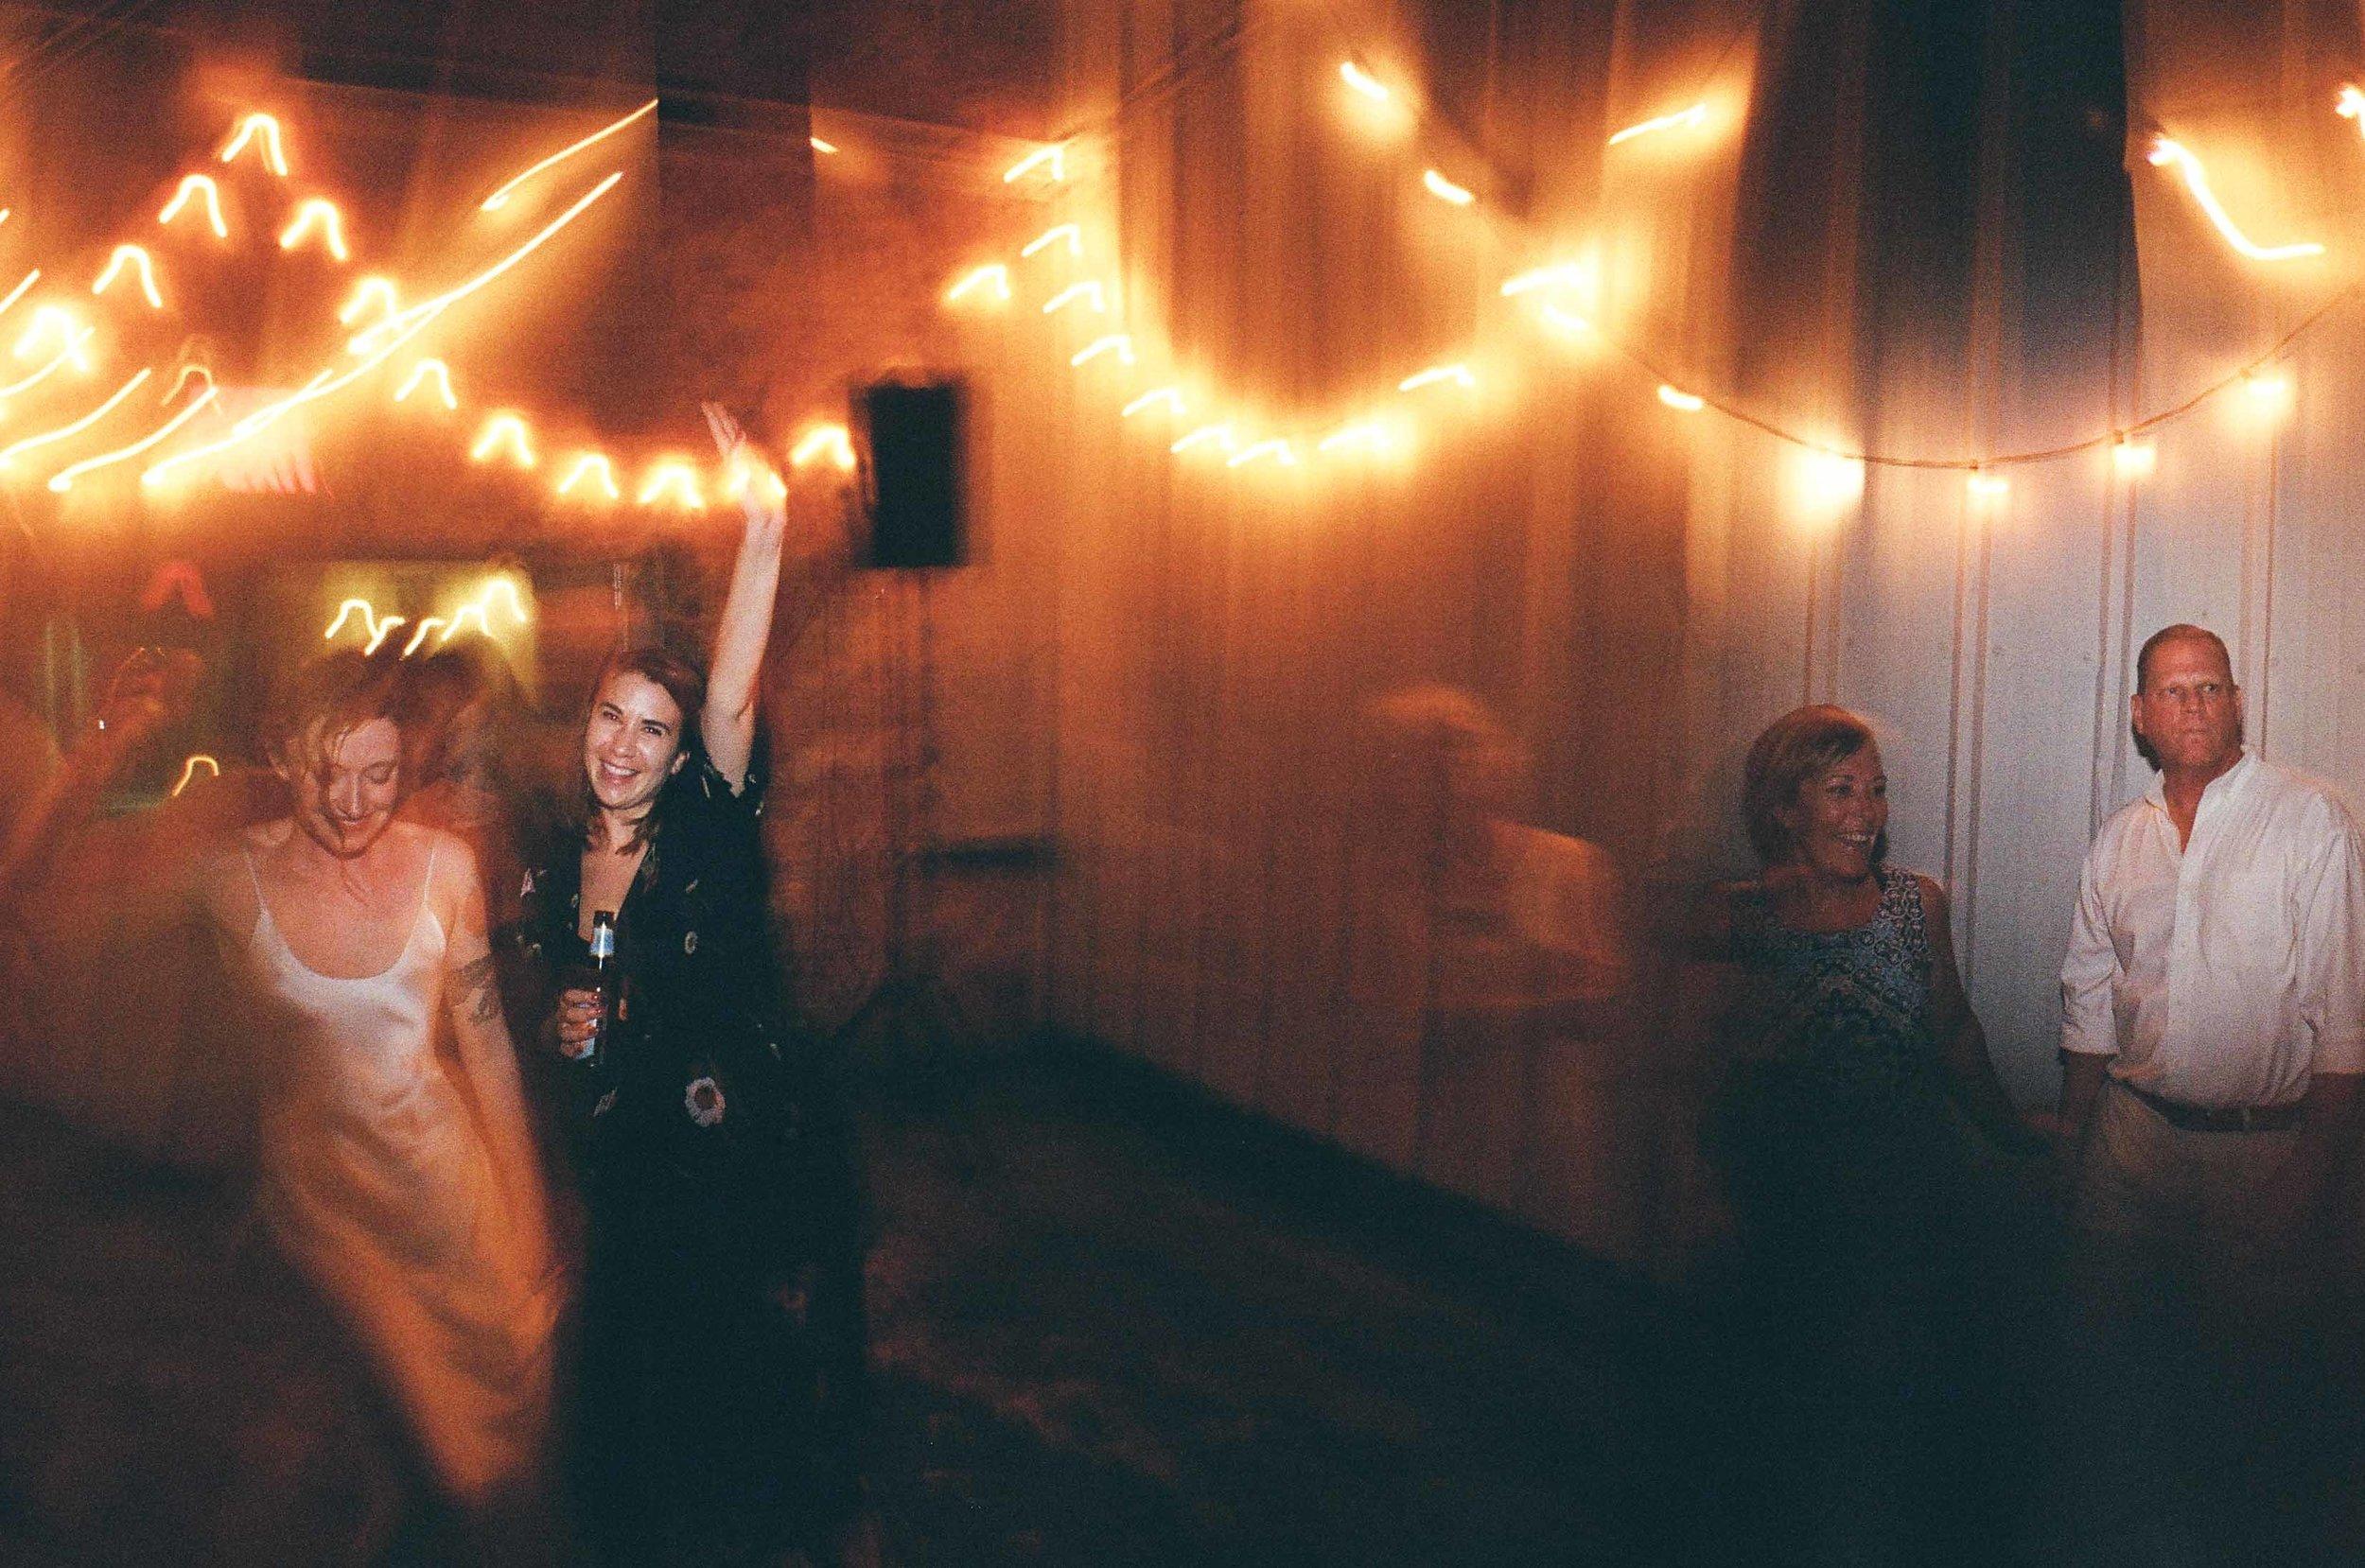 35mm_Film_Wedding_Photographer_Chellise_Michael_Photography-42.jpg